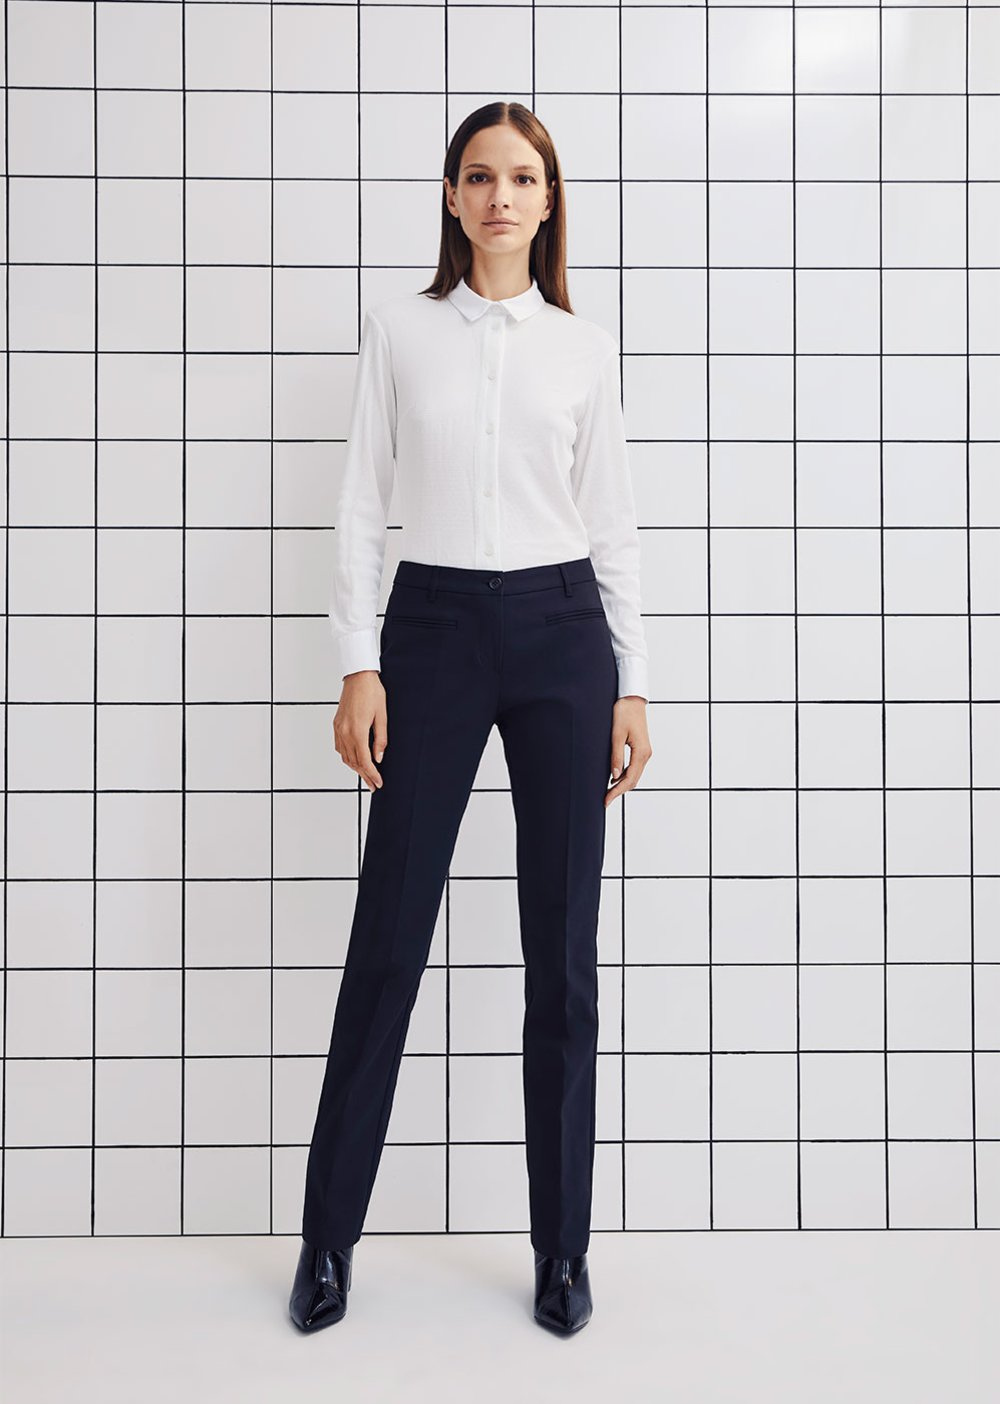 Pantalone Carrie 5 tasche - Black - Donna